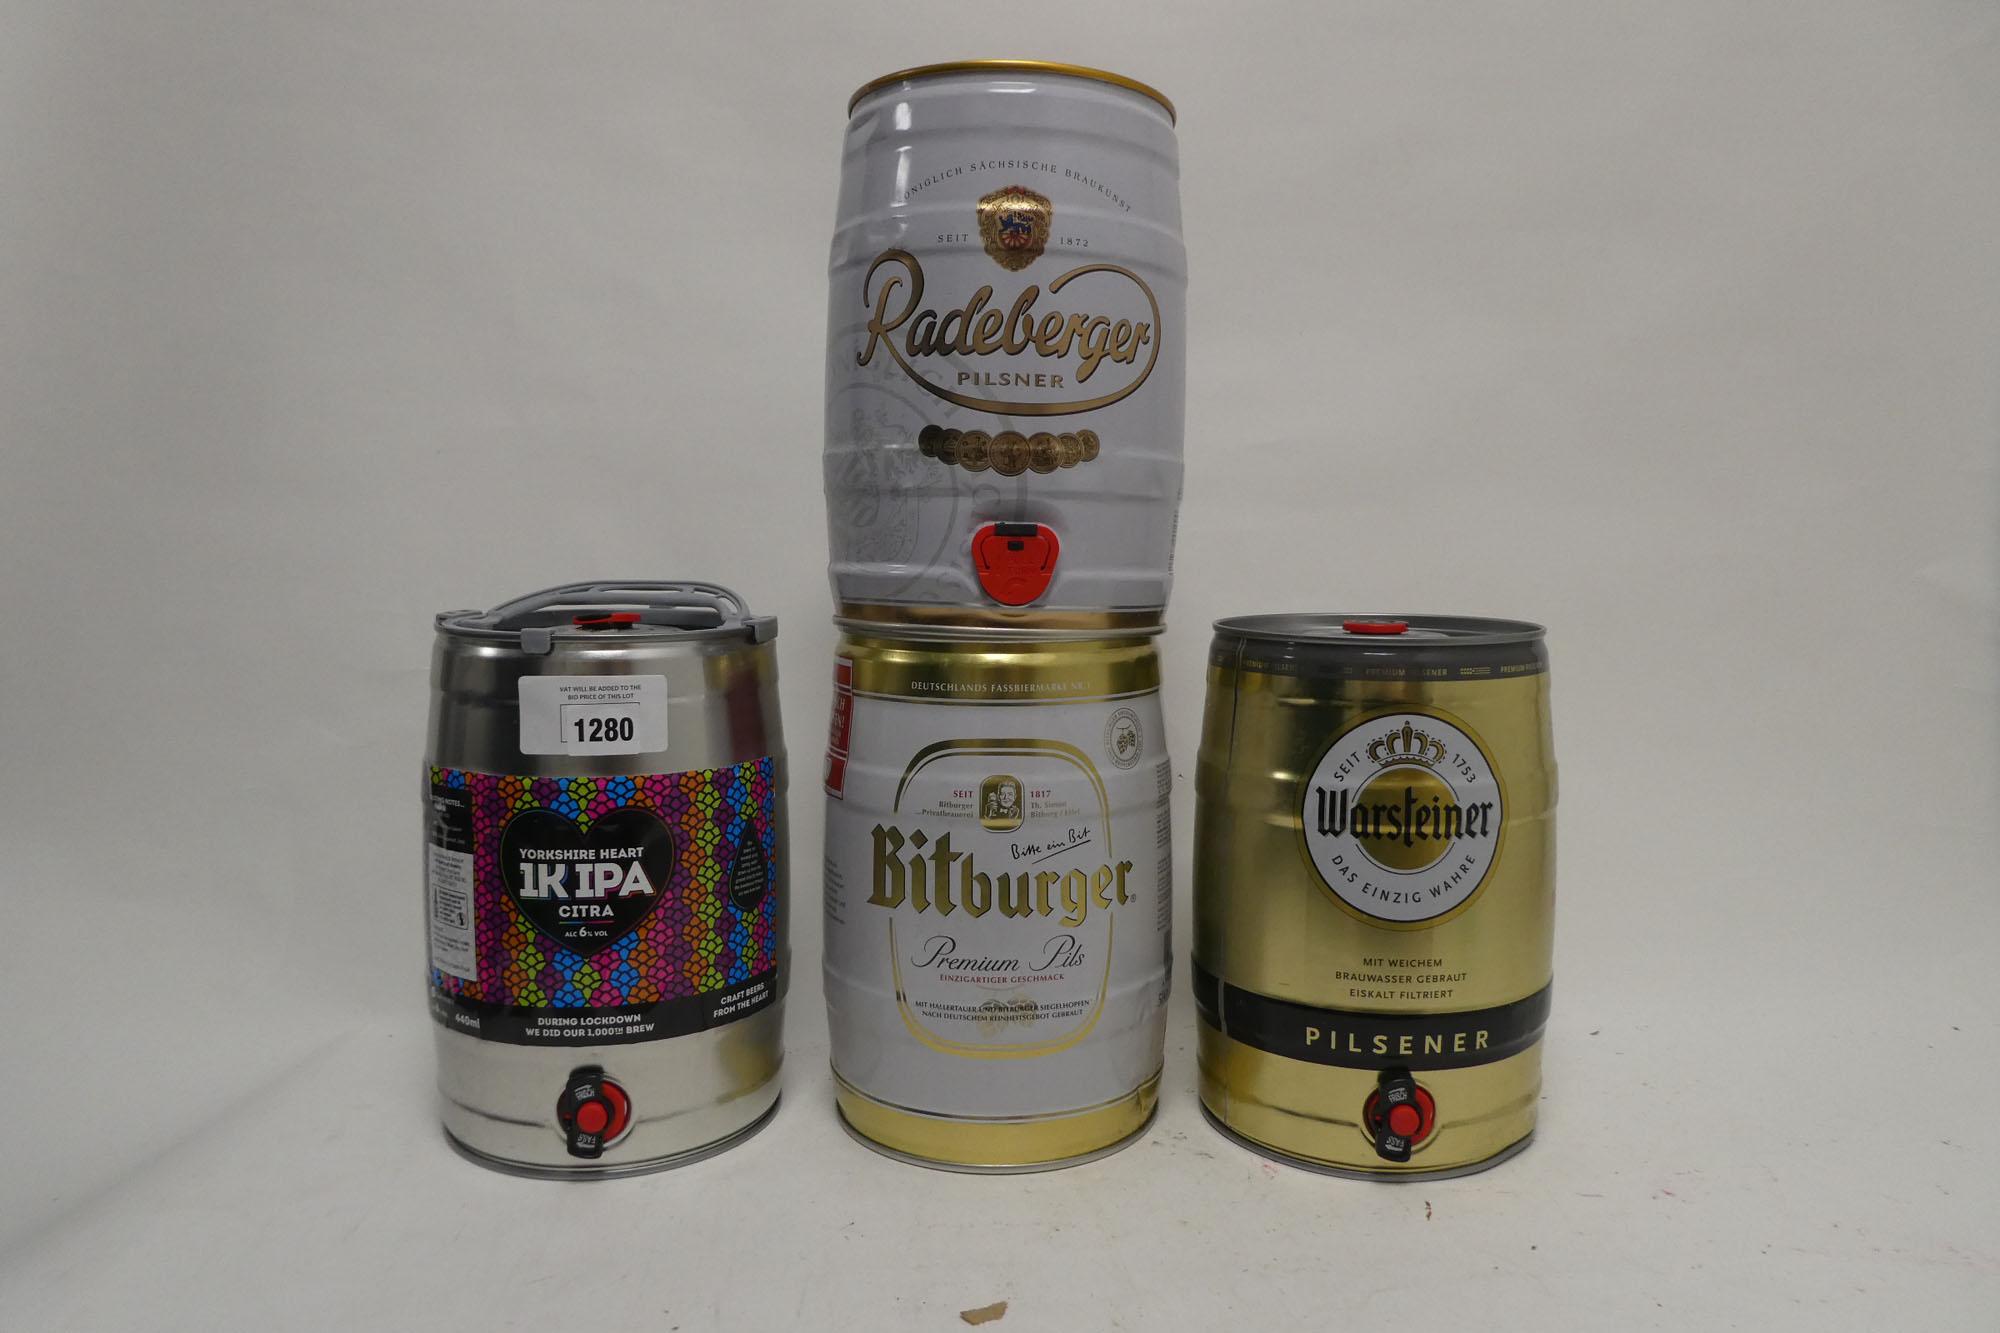 4 Kegs of Beer, 1x Yorkshire Heart 1K IPA Citra 4.4litre 6%, 1x Bitburger Premium Pils 5 litre 4.